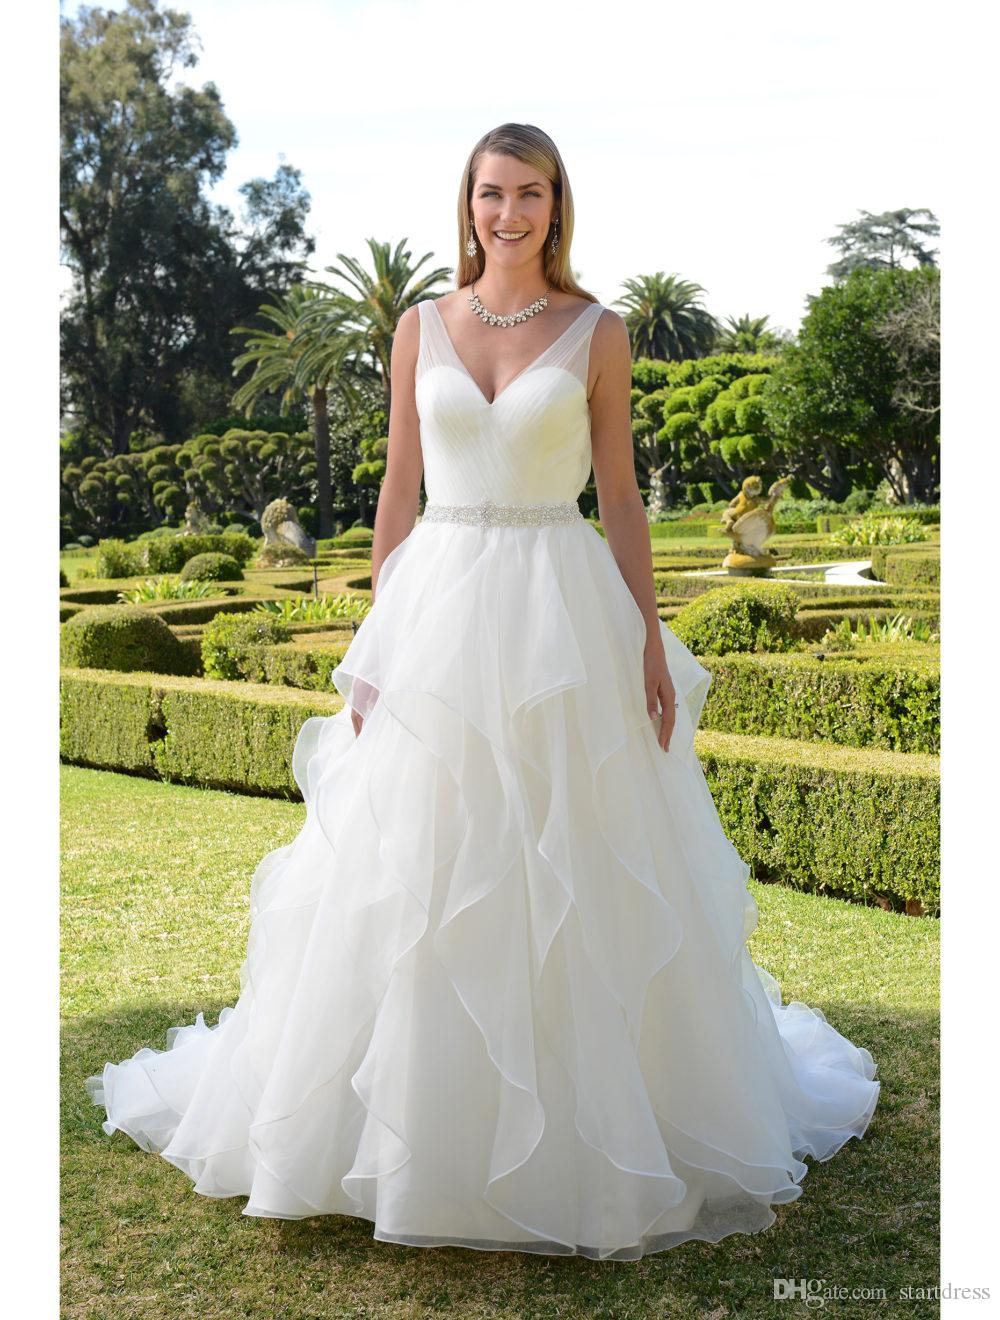 Vintage A Line Organza Country Wedding Dresses Sexy Plugging V-neck Boho Wedding Dress Sheer Straps Crystal Sash Cascading Ruffles Bridal